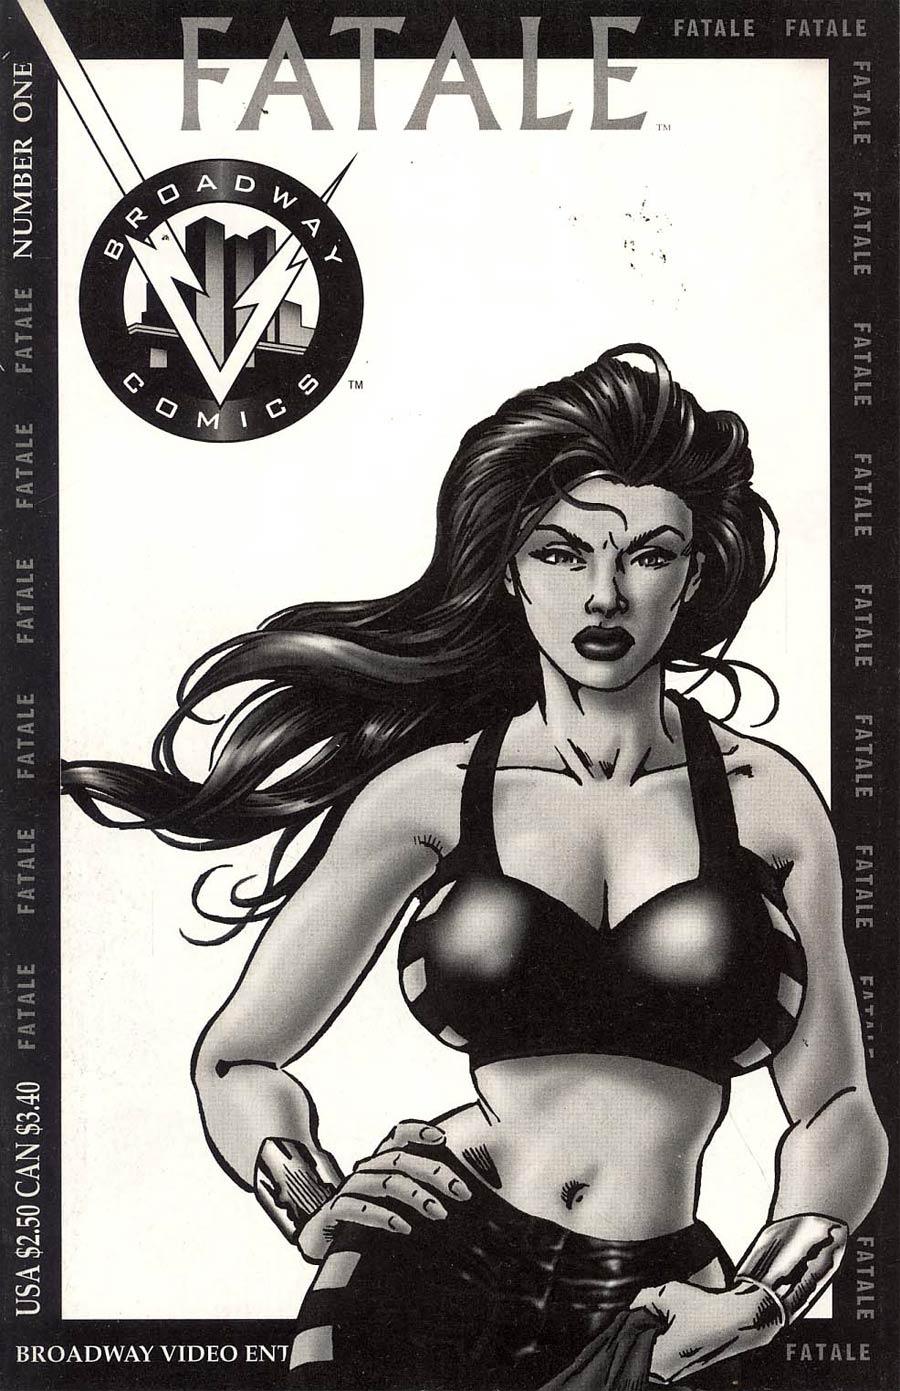 Fatale (Broadway Comics) Preview Edition